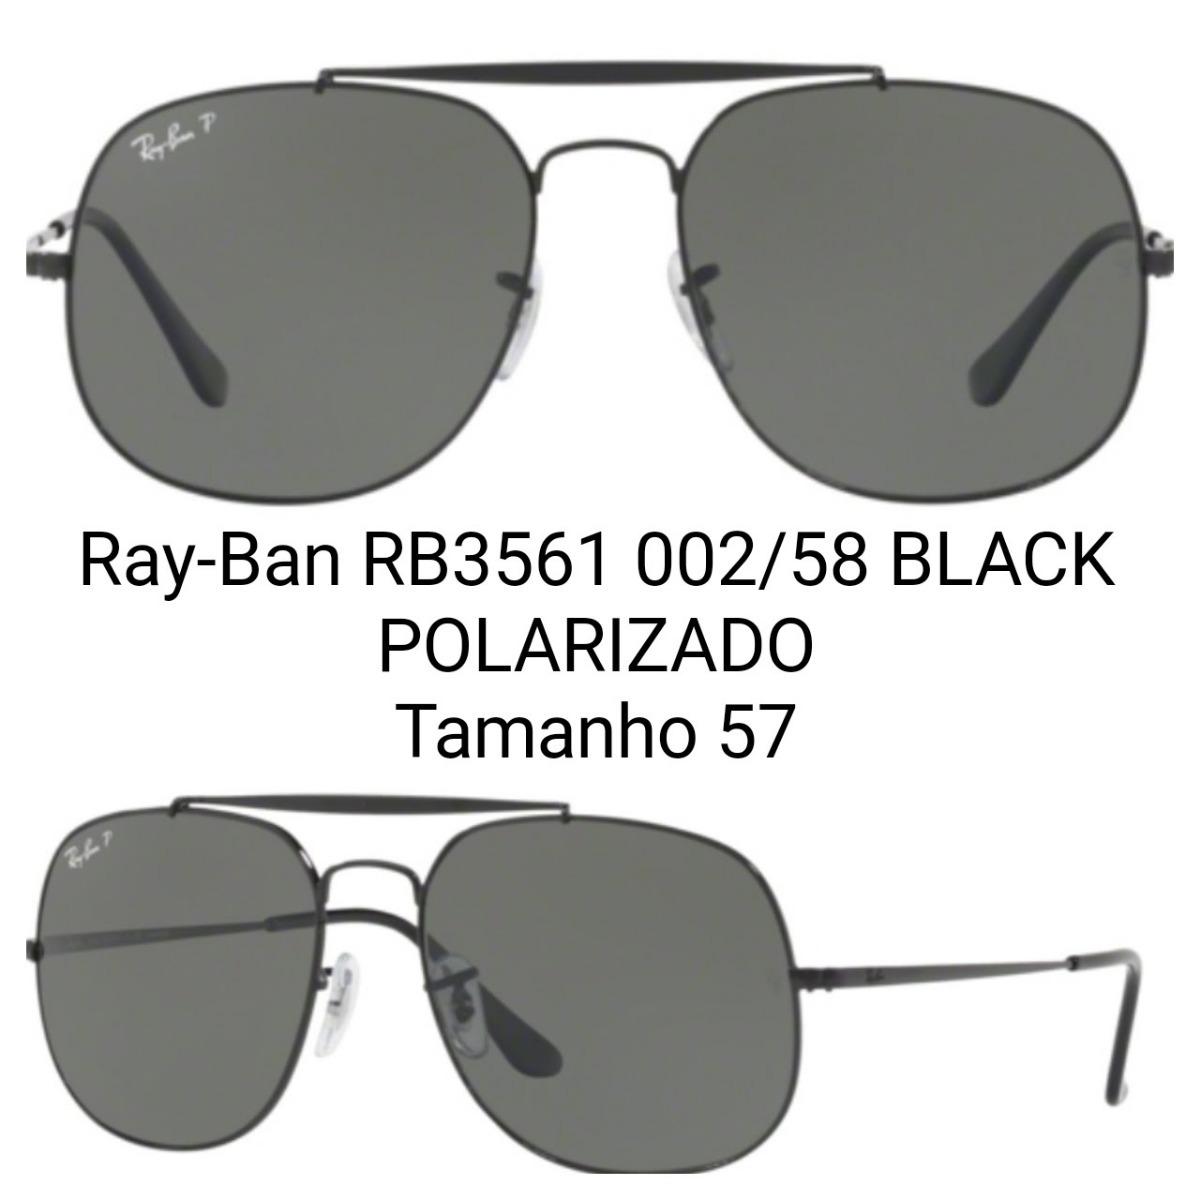 dac92a42b45e9 óculos ray-ban general - rb3561 - polarizado - frete grátis. Carregando  zoom.